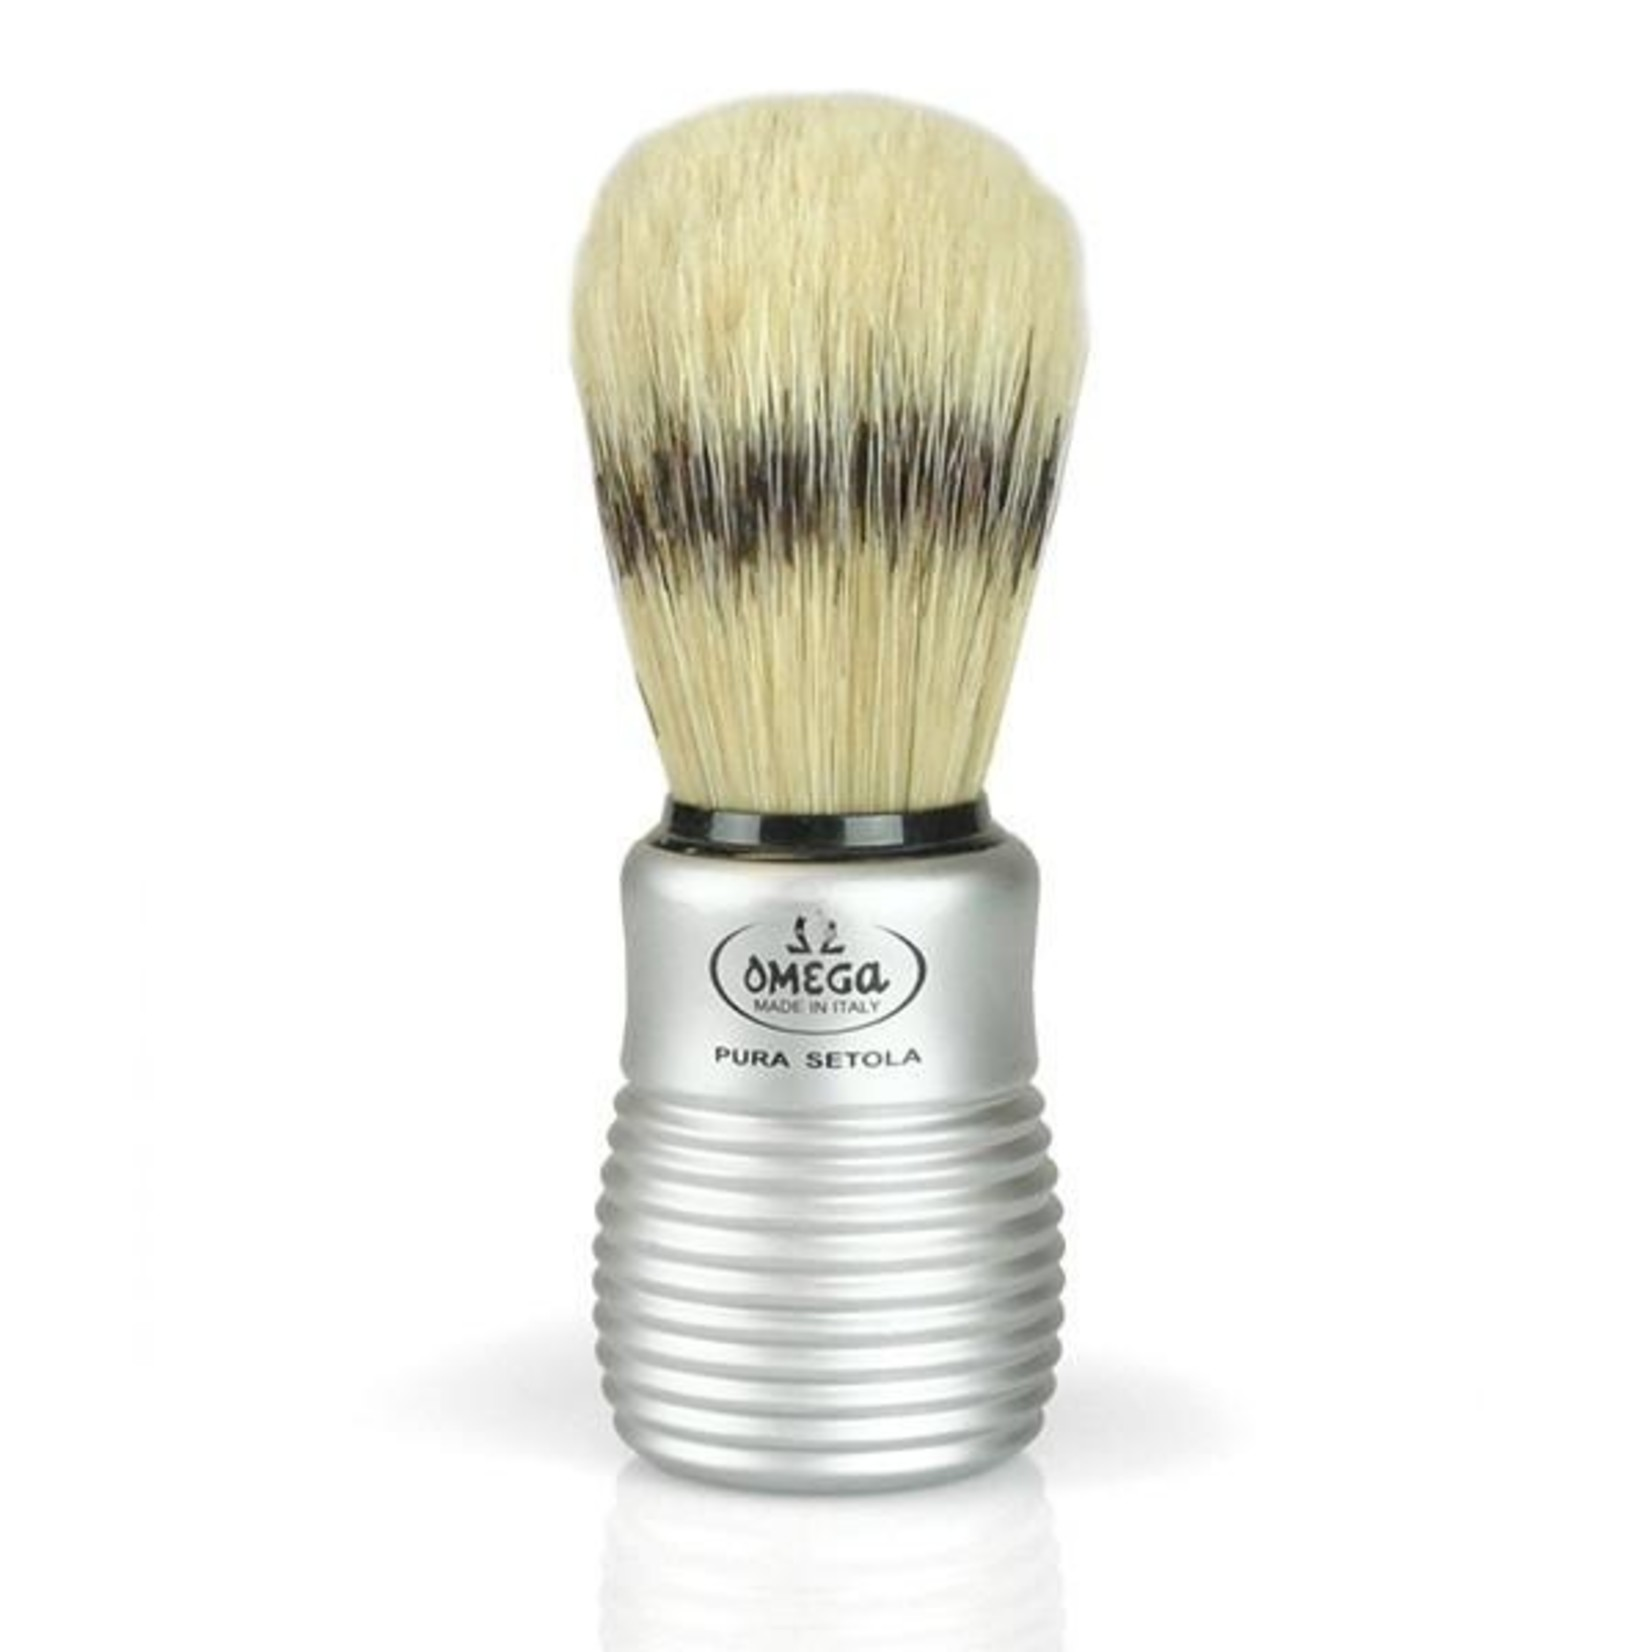 Pre de Provence Aluminum Handled Men's Shave Brush